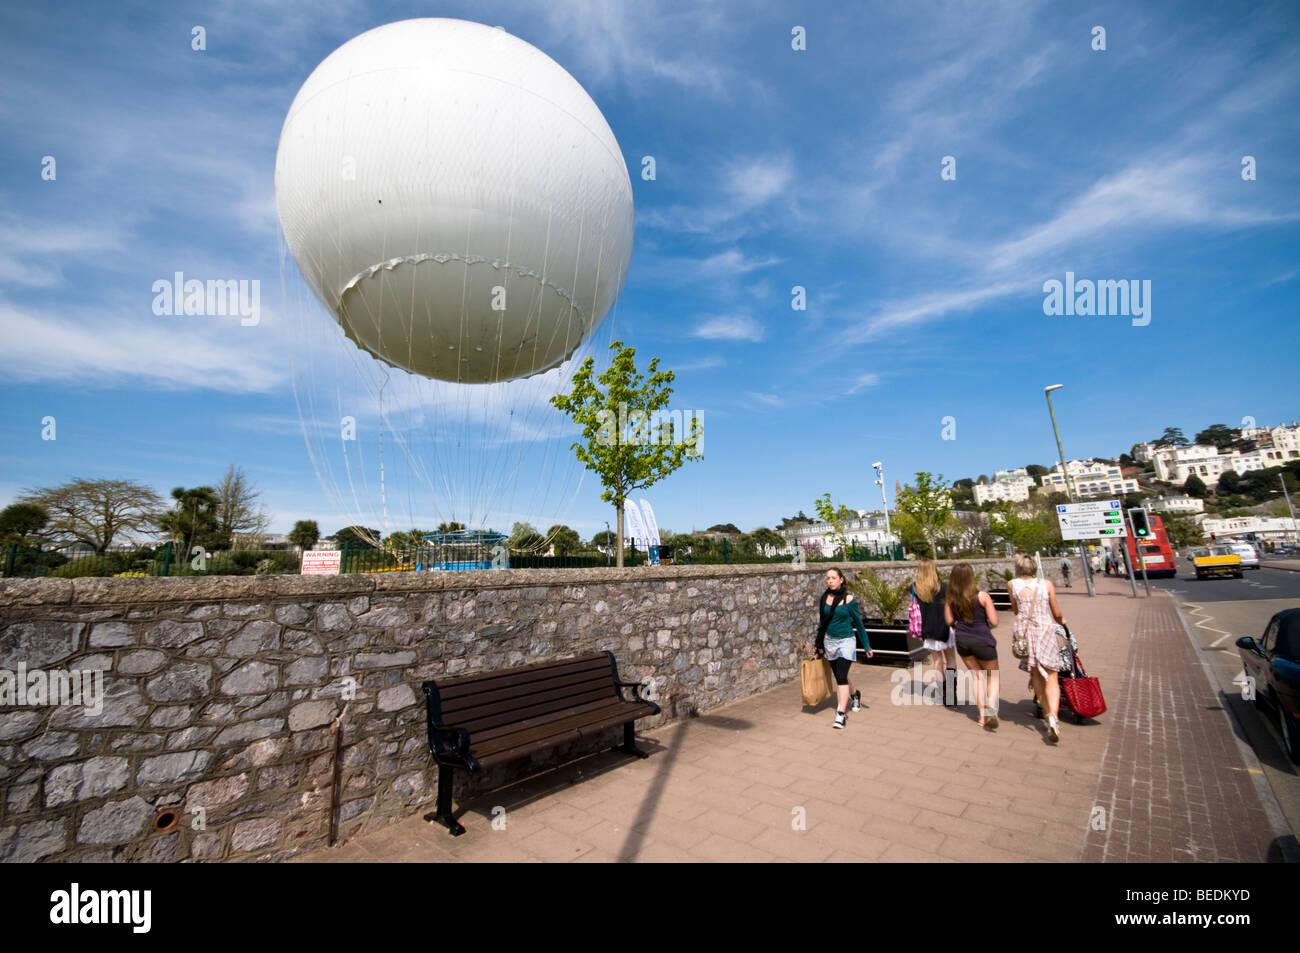 Hot Air Baloon, Torquay Seafront, Devon, UK - Stock Image